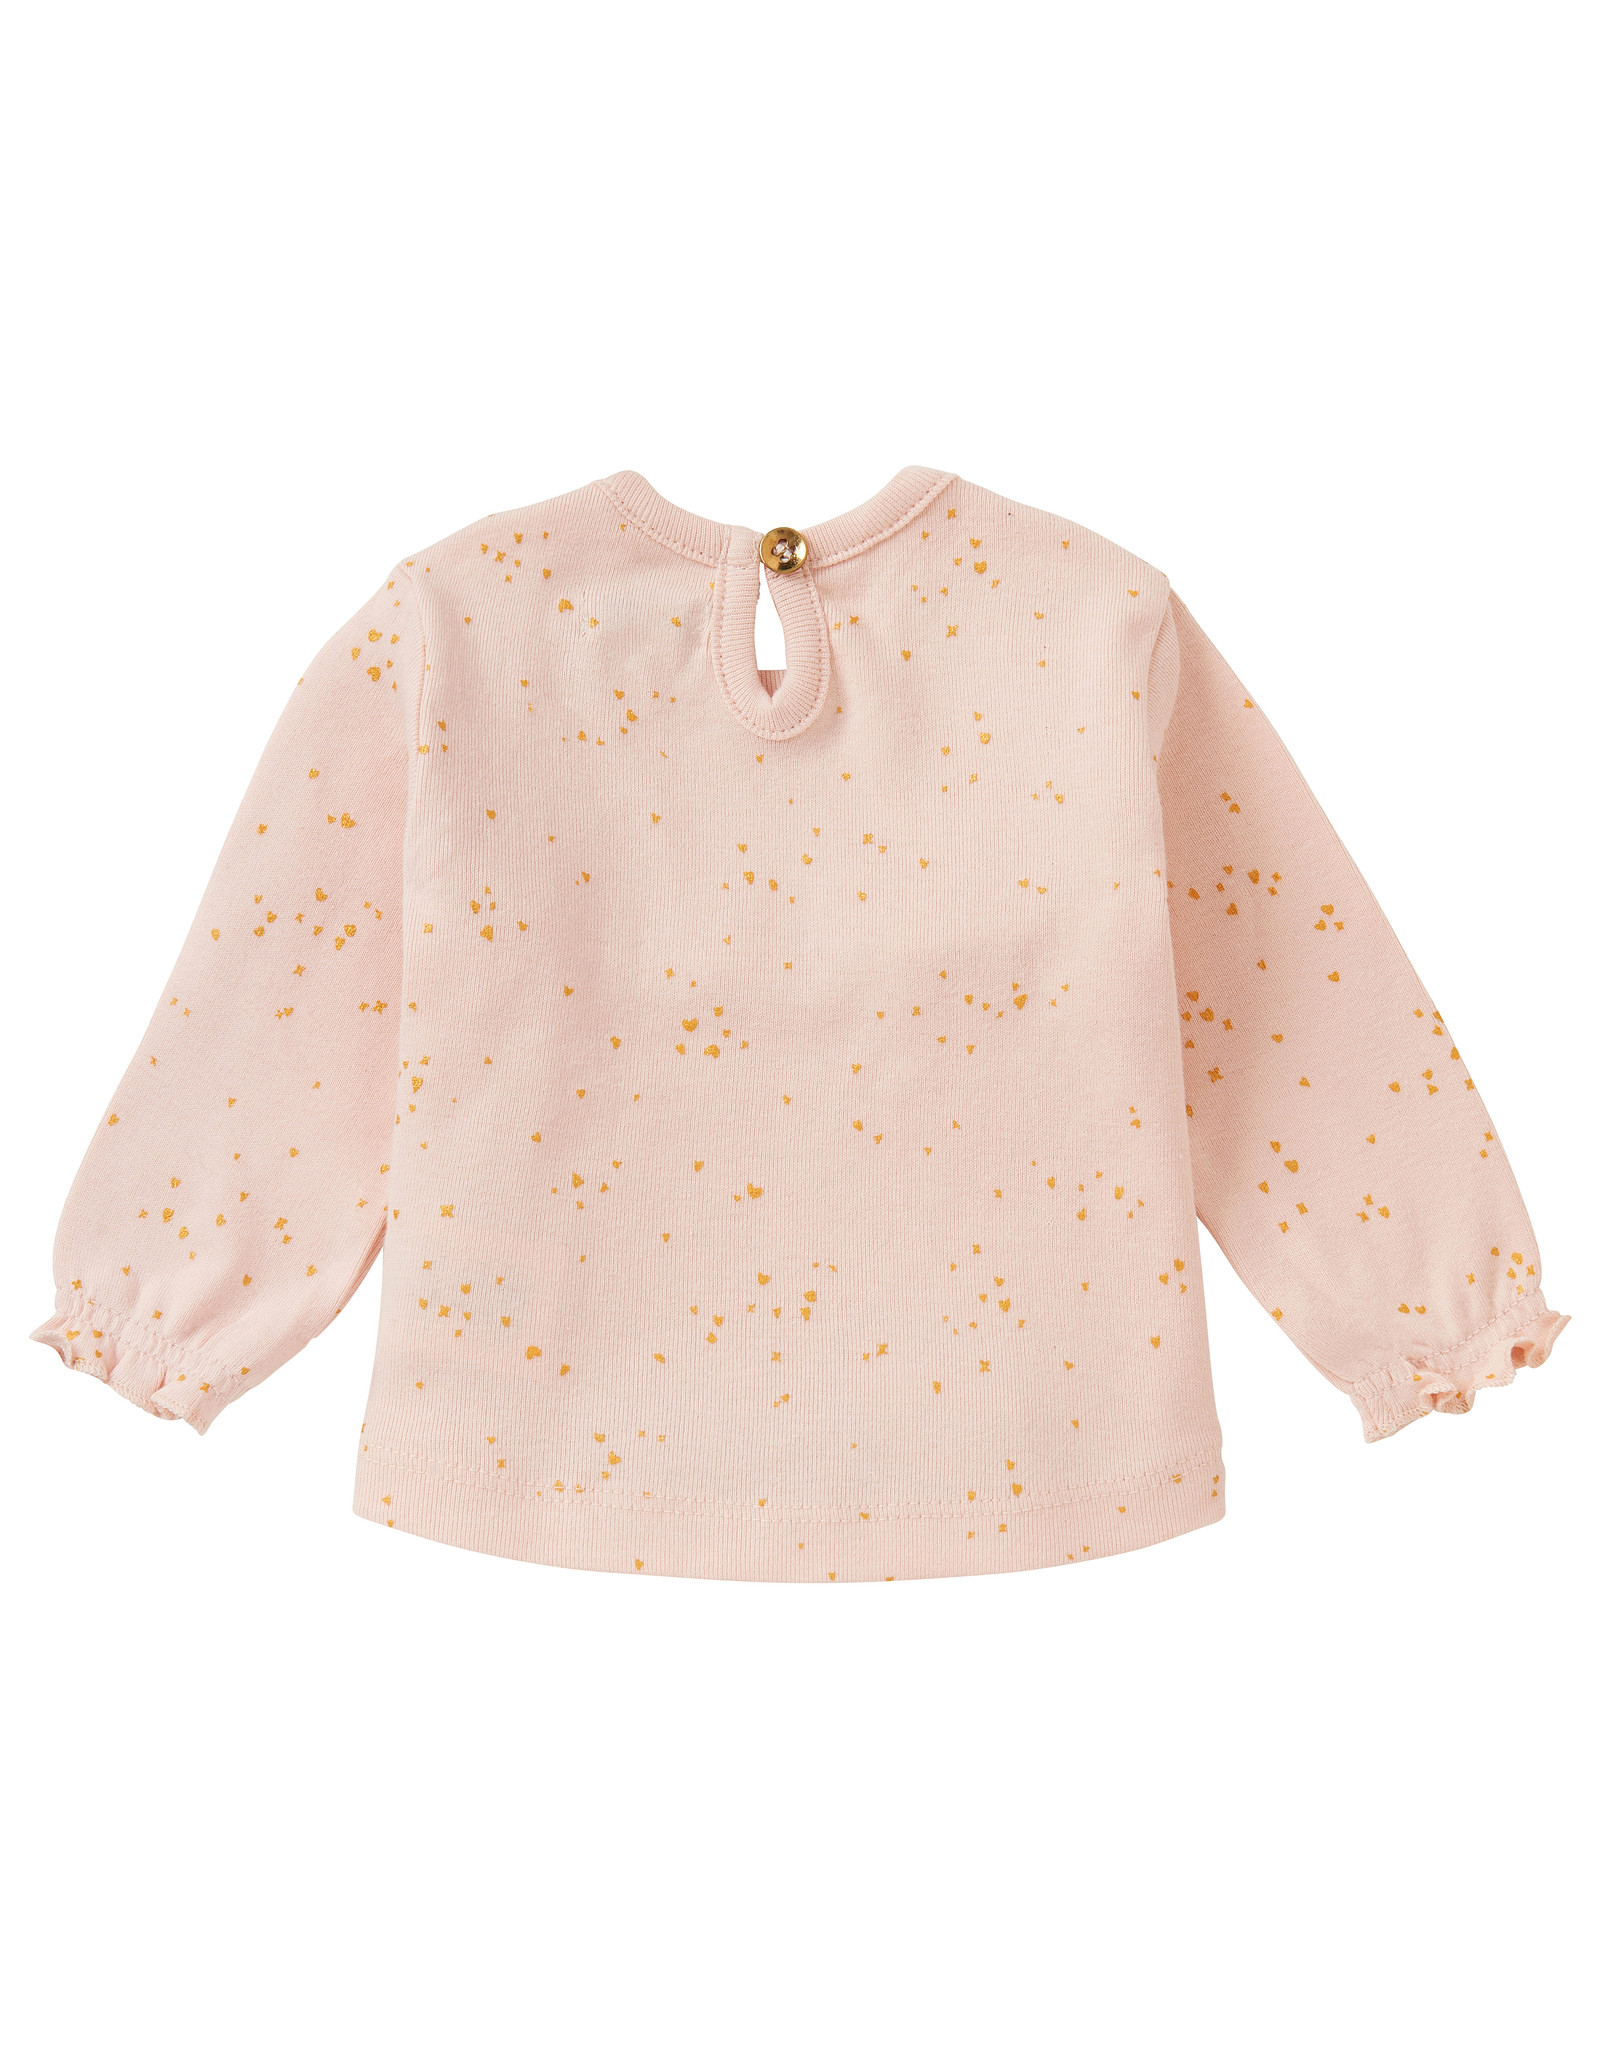 Noppies G Regular T-Shirt LS Colesberg AOP, Pale Dogwood